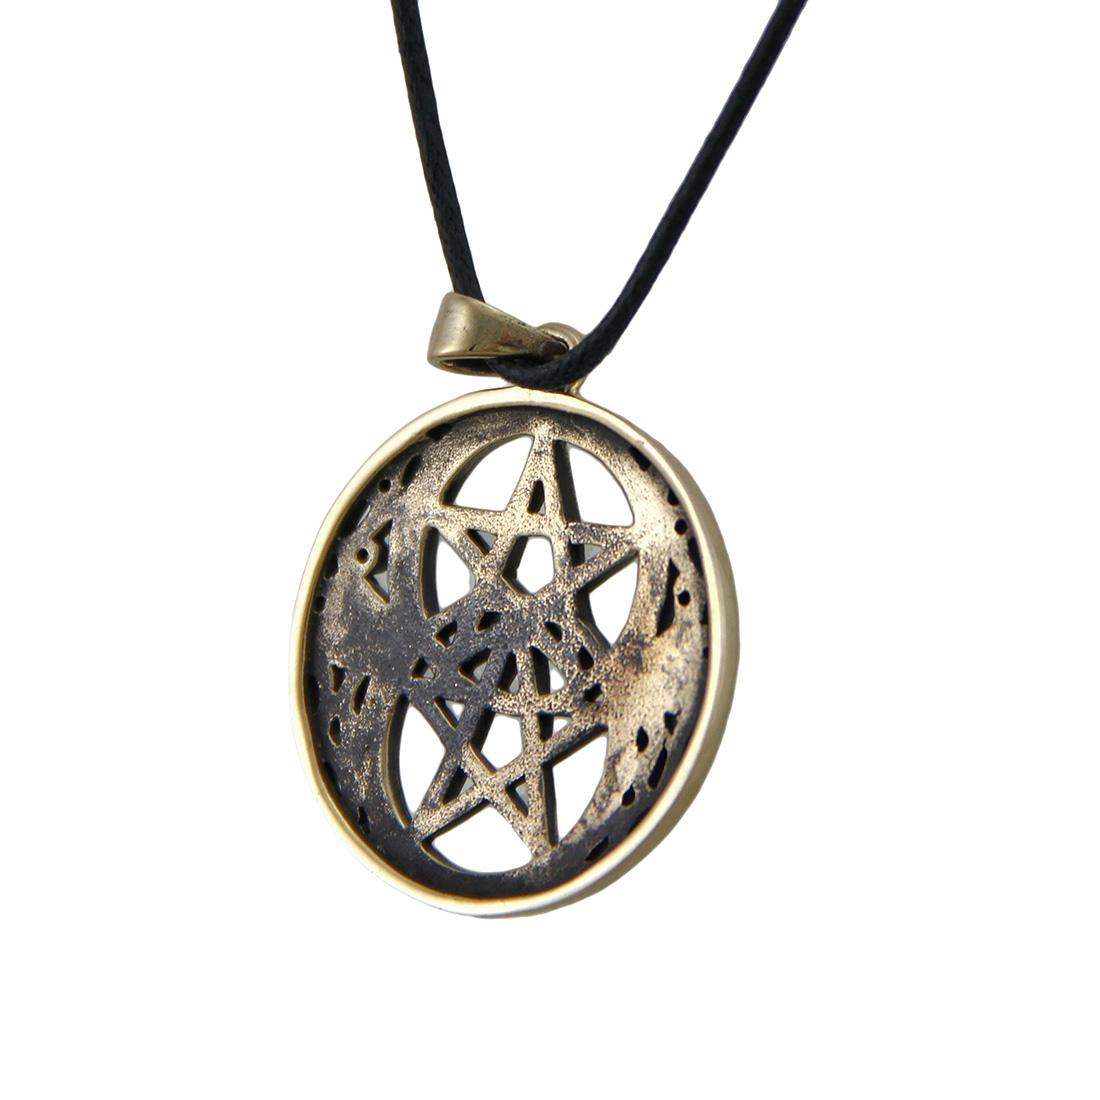 Double Pentacle Bronze Finish Pewter Pendant on Cord Necklace - image 1 de 3